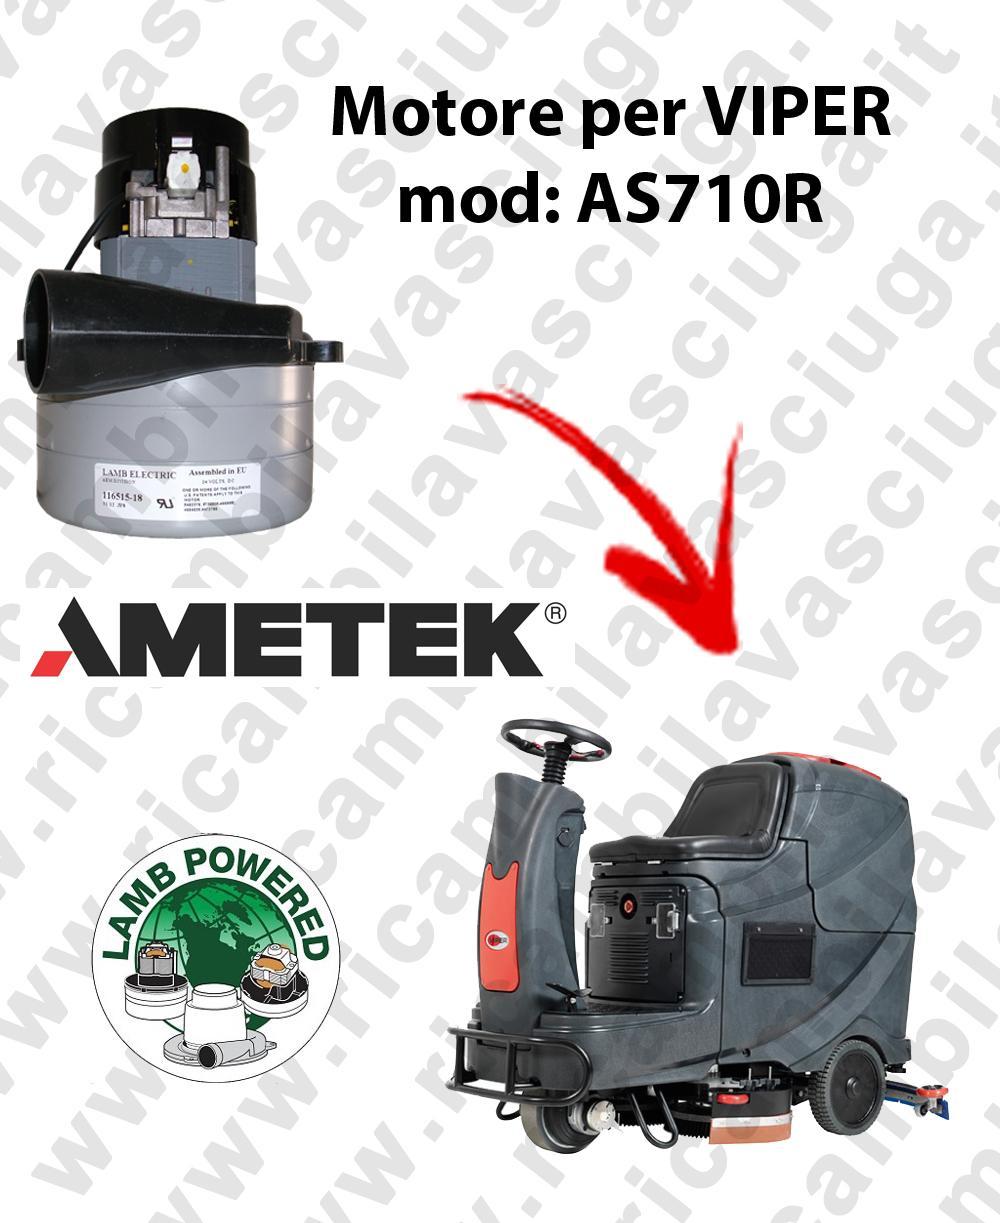 AS710R Motore de aspiraciónLAMB AMETEK para fregadora VIPER